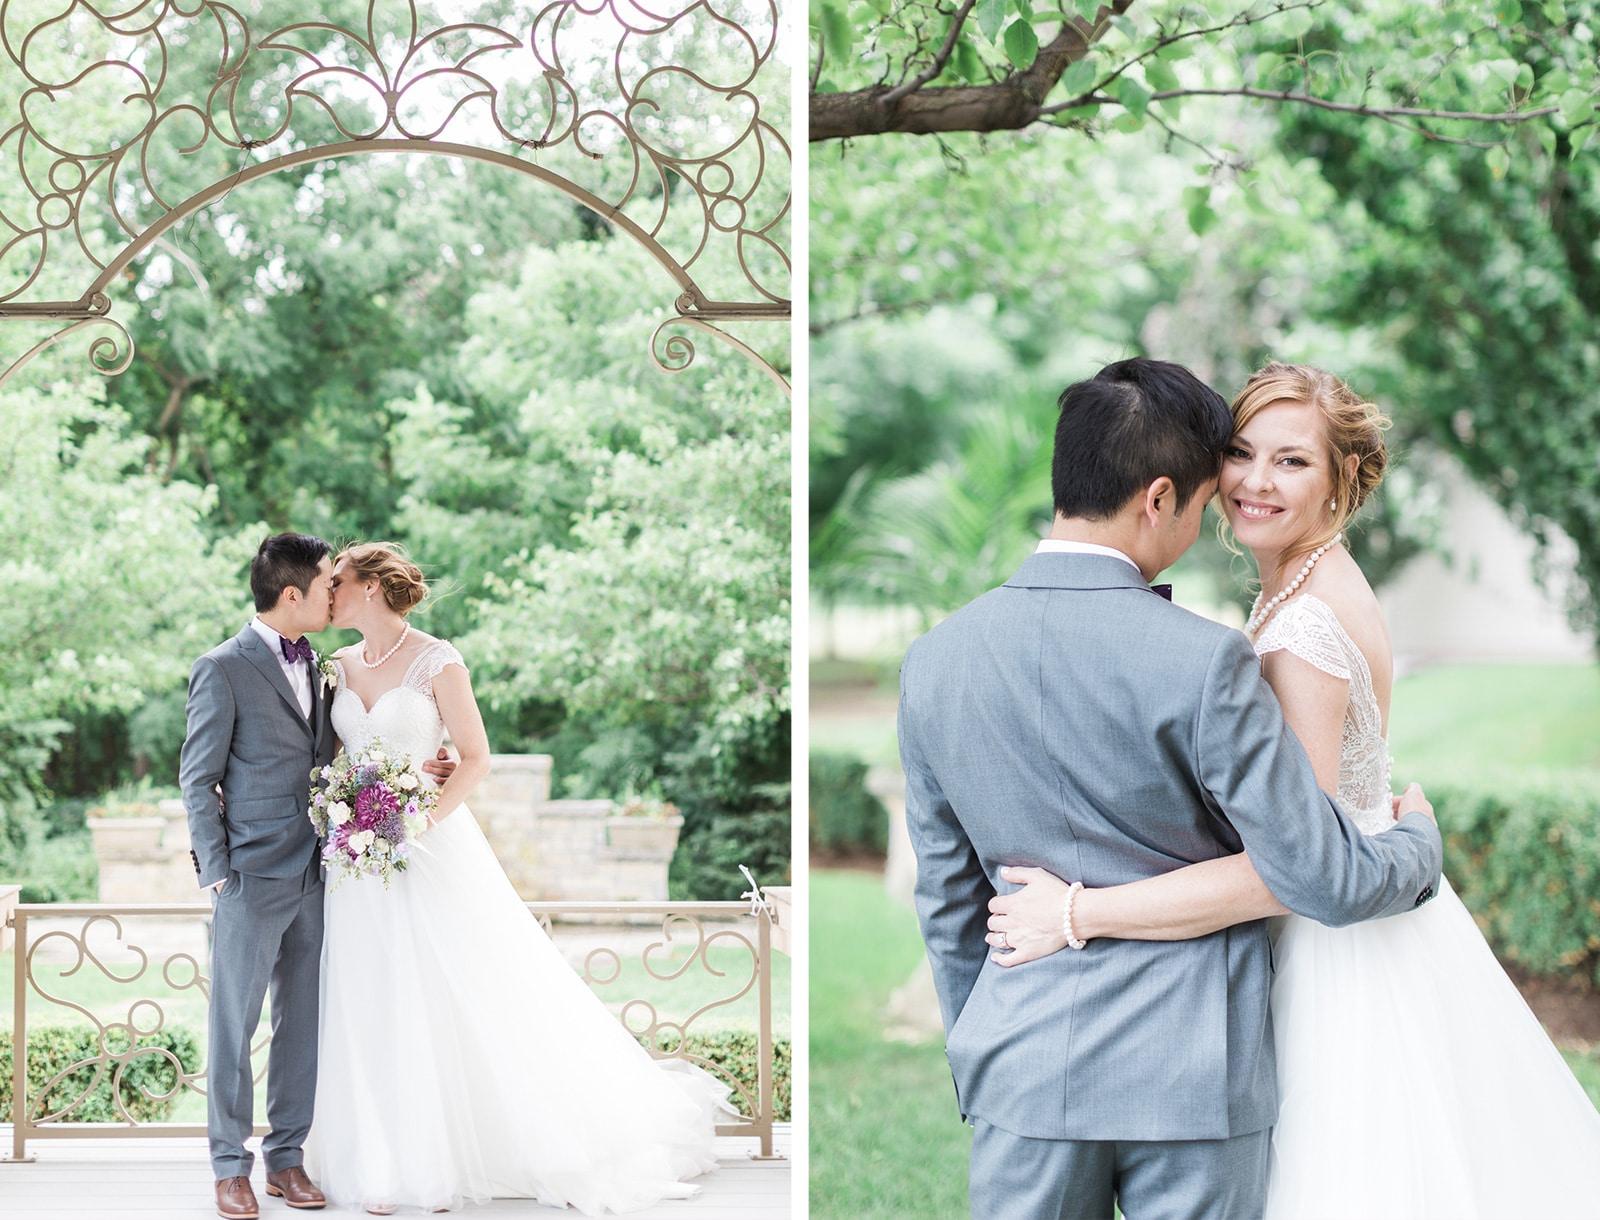 Outdoor Garden Wedding at Ascott Parc: Allison + Jason